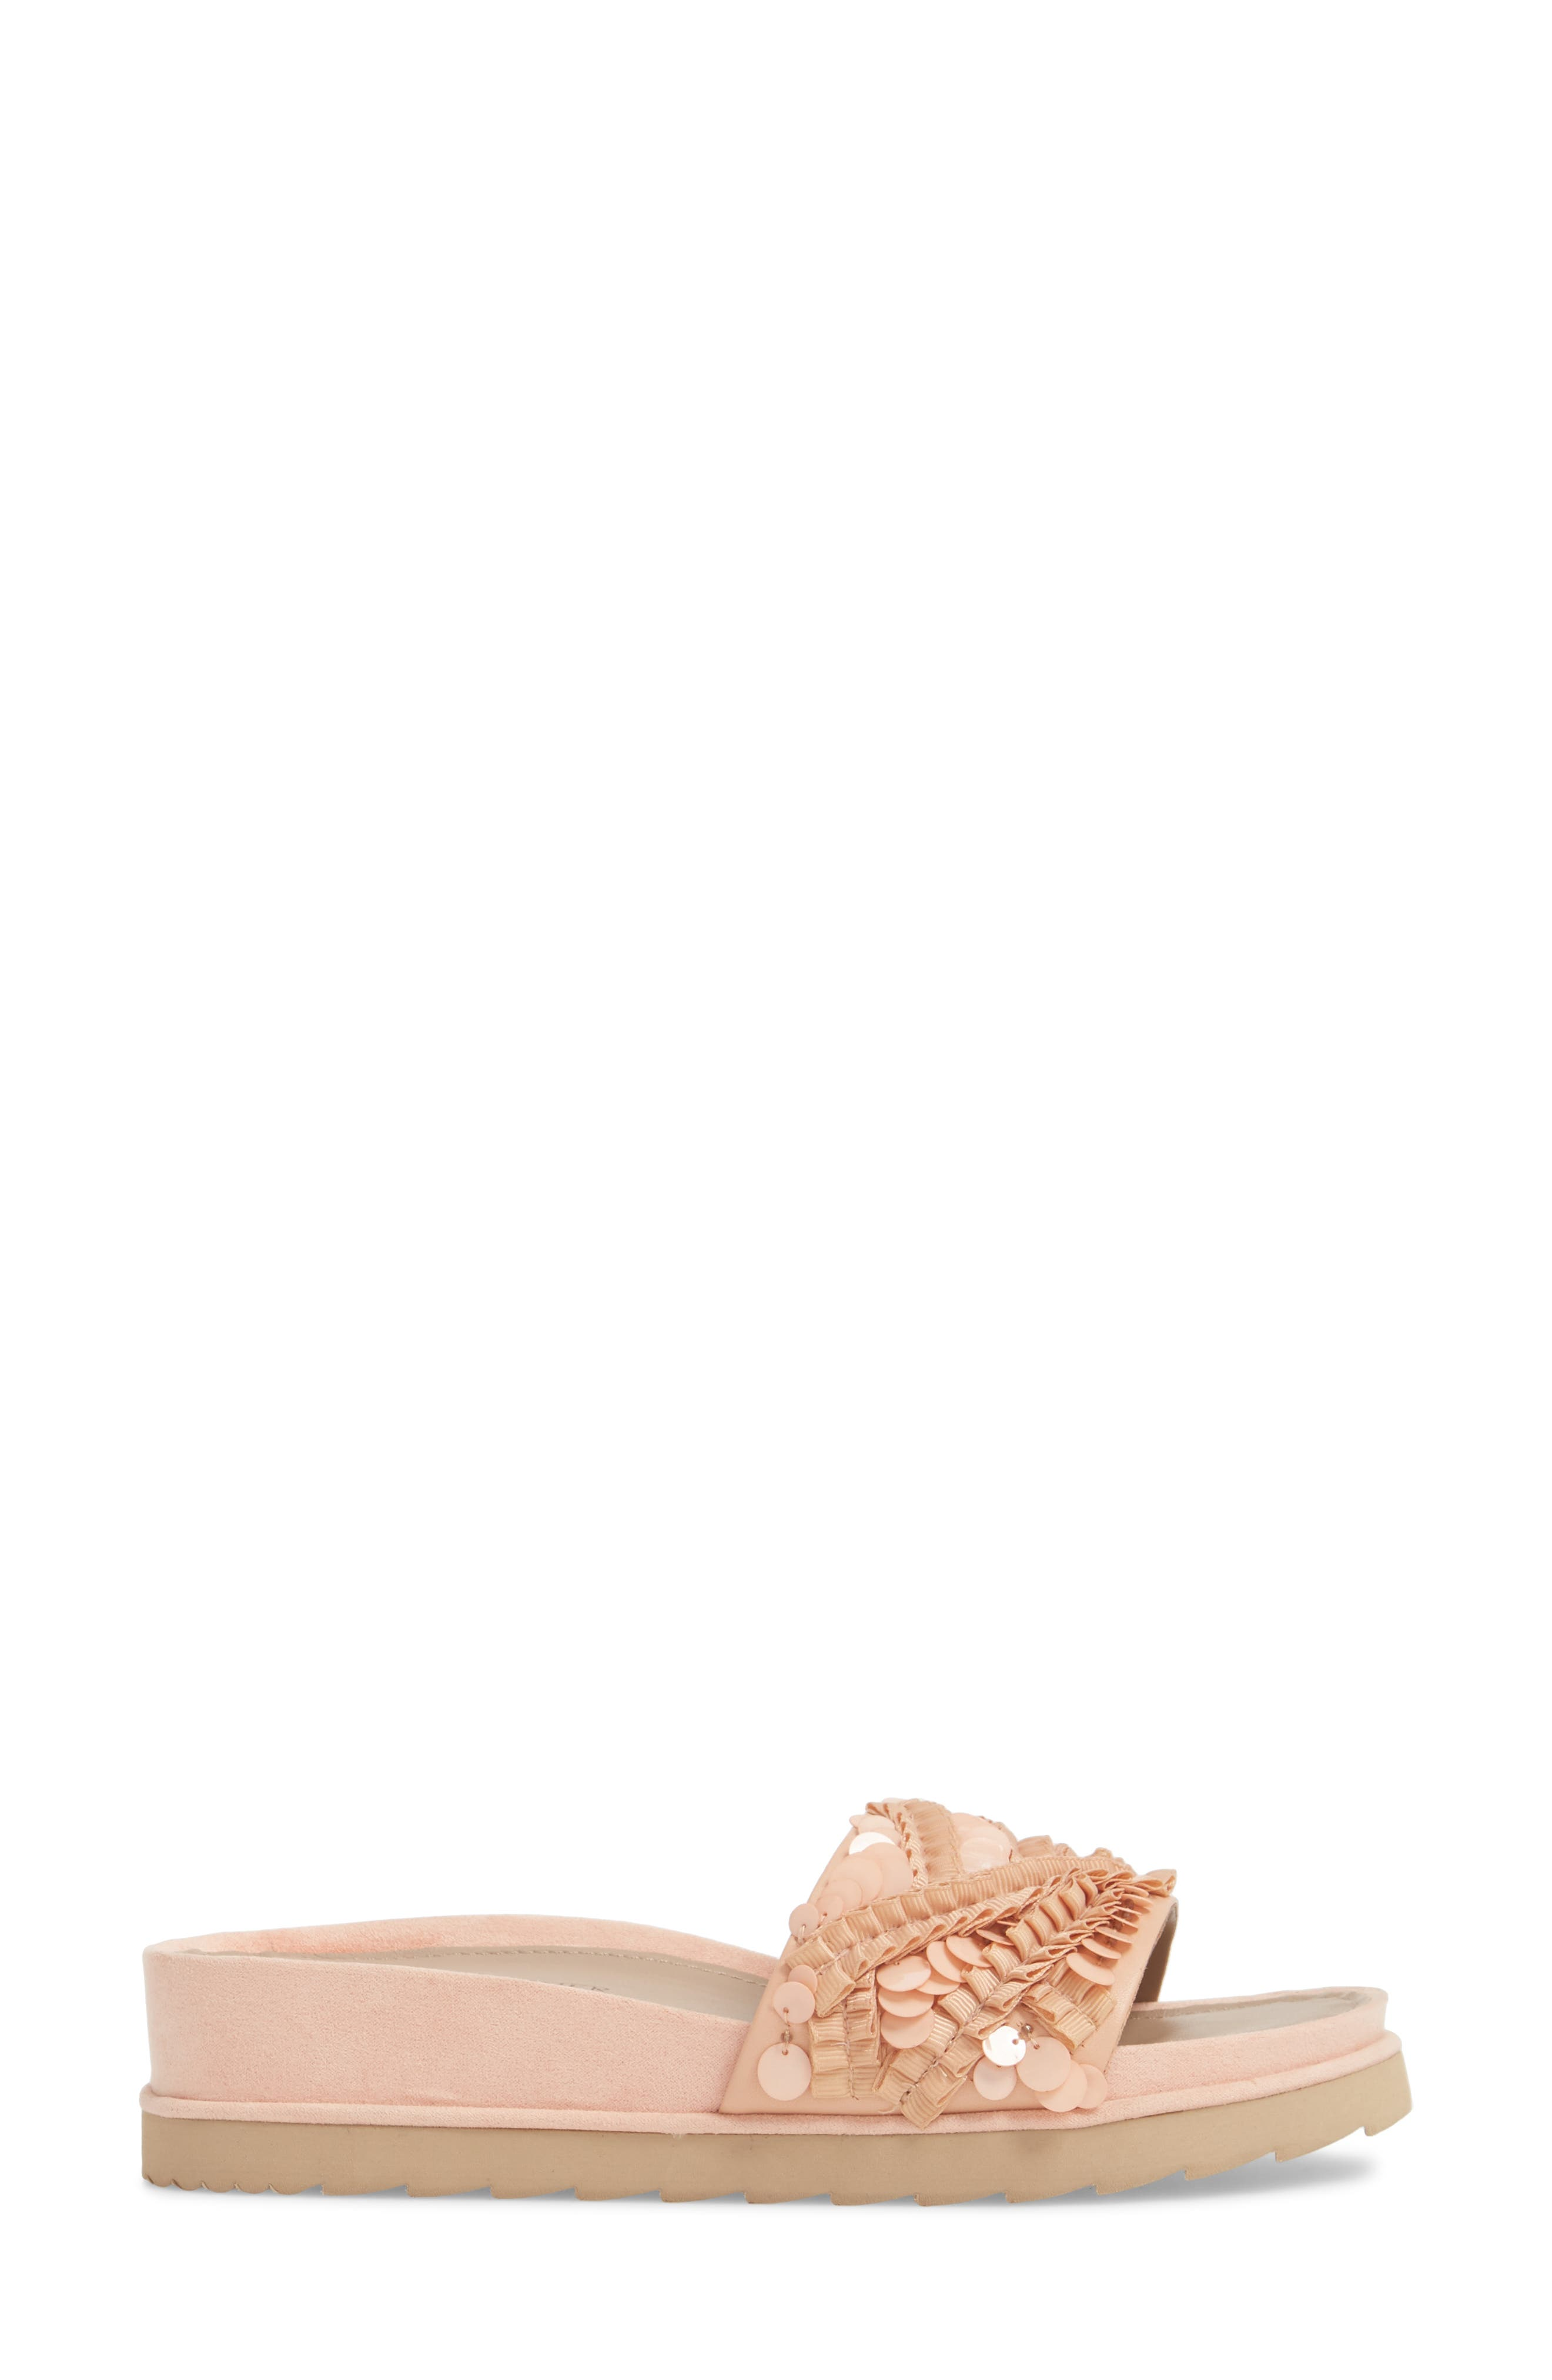 Cava Slide Sandal,                             Alternate thumbnail 5, color,                             Peony Leather